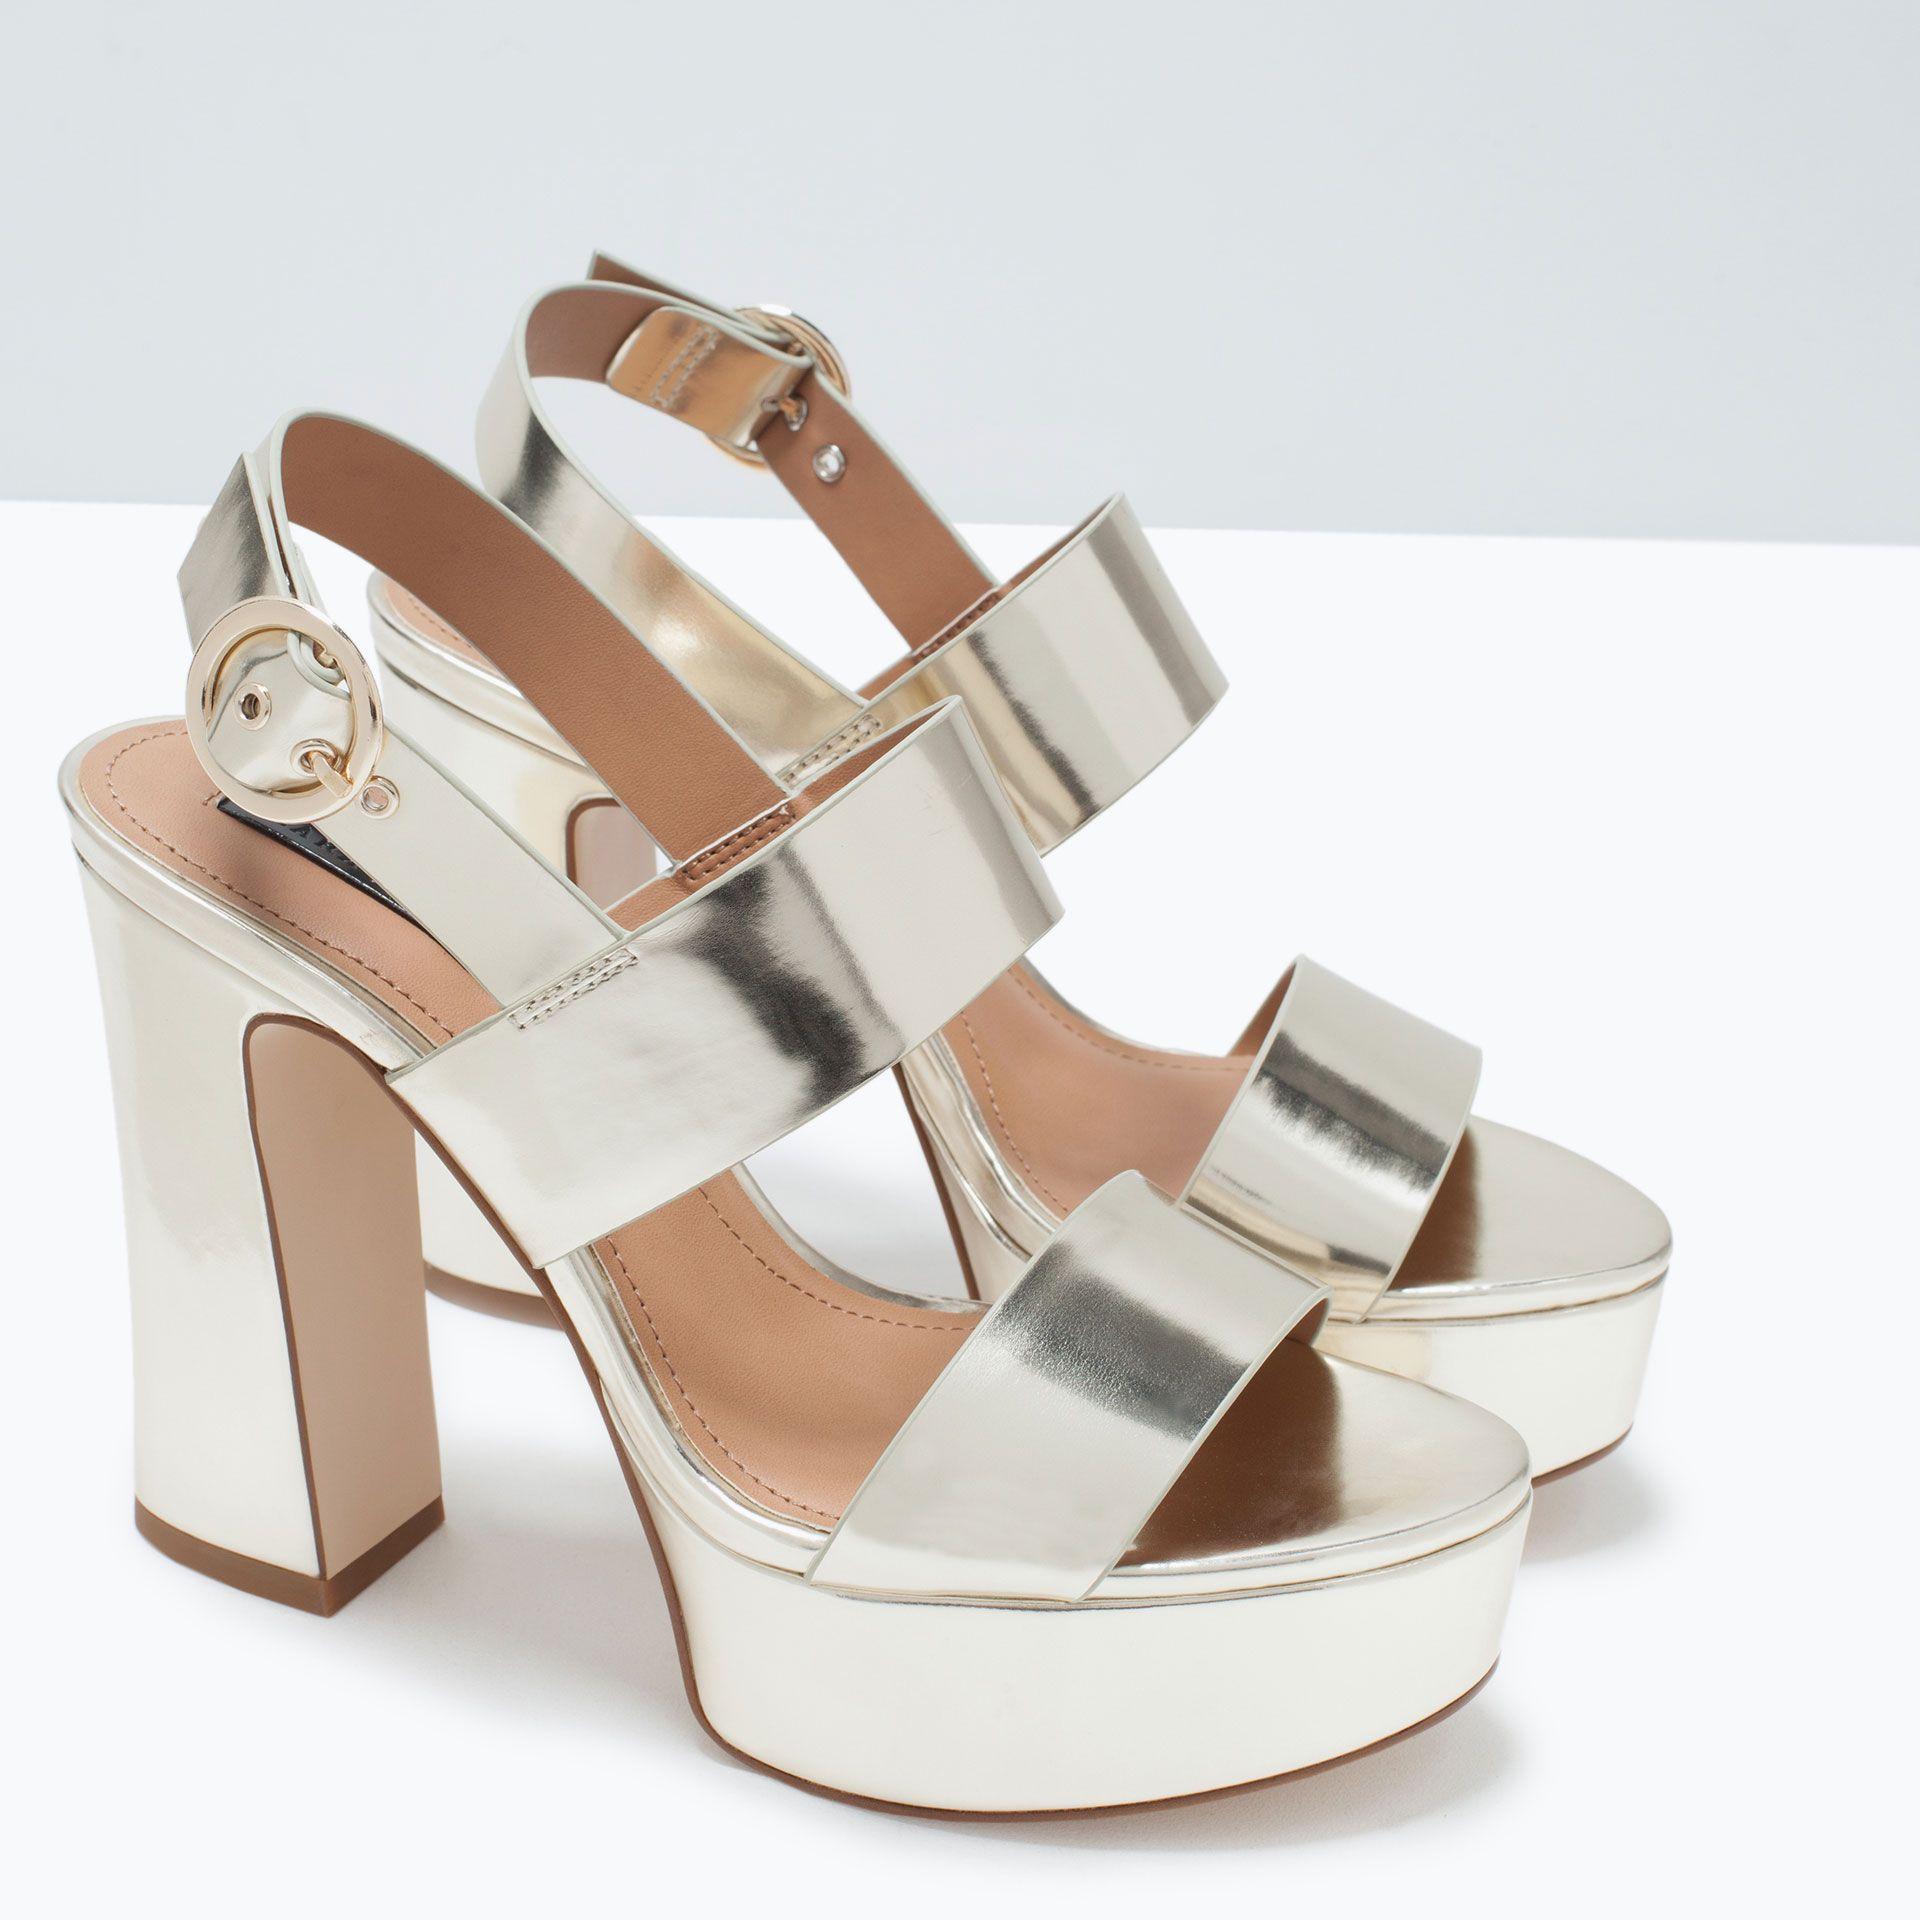 Sandales France Plateforme Femme À Zara Trf Chaussures rn84rqwzv